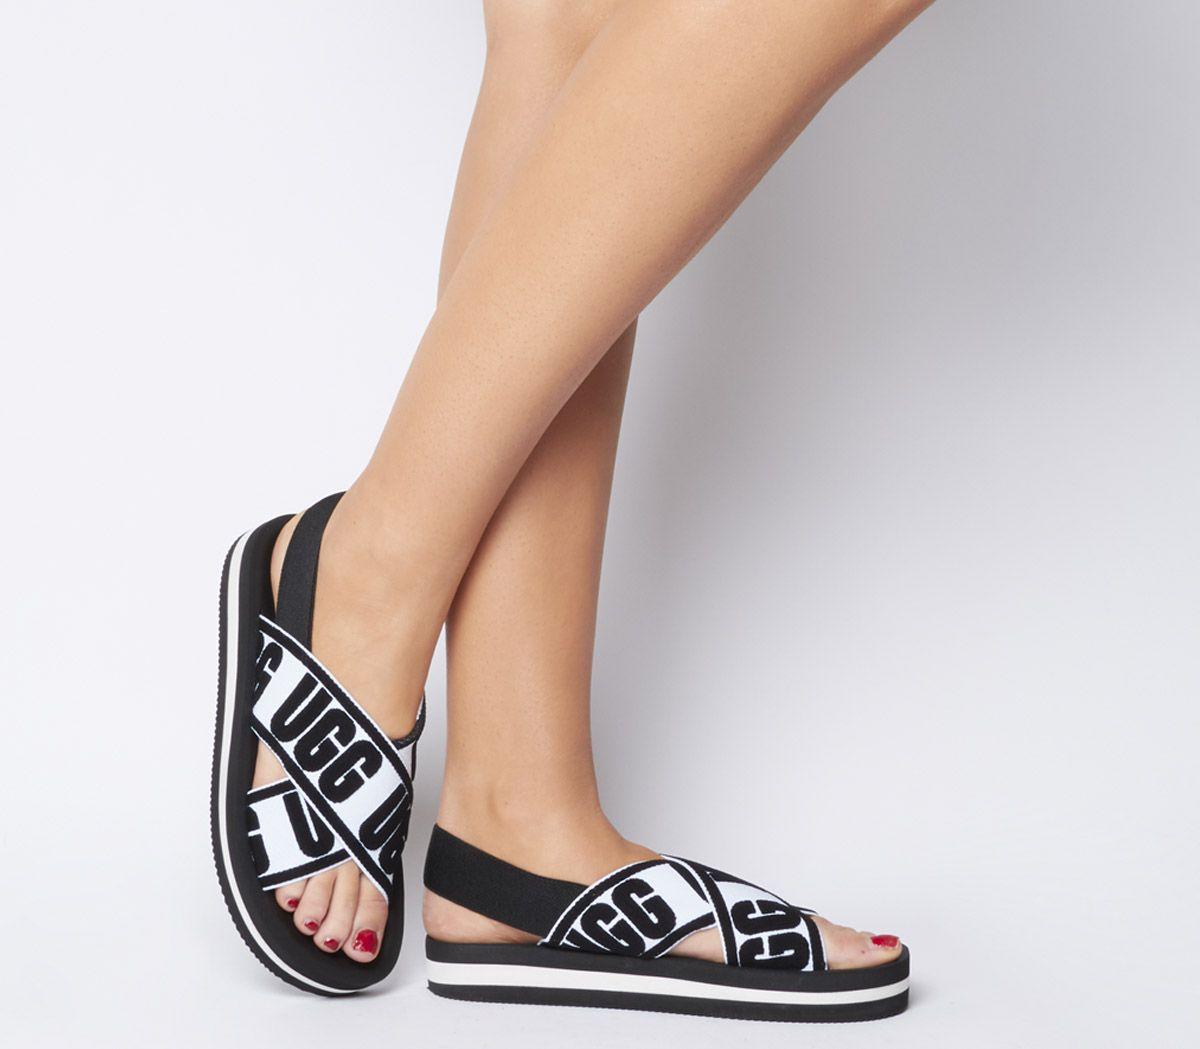 907ac474312b UGG Marmont Graphic Sandals Black - Sandals